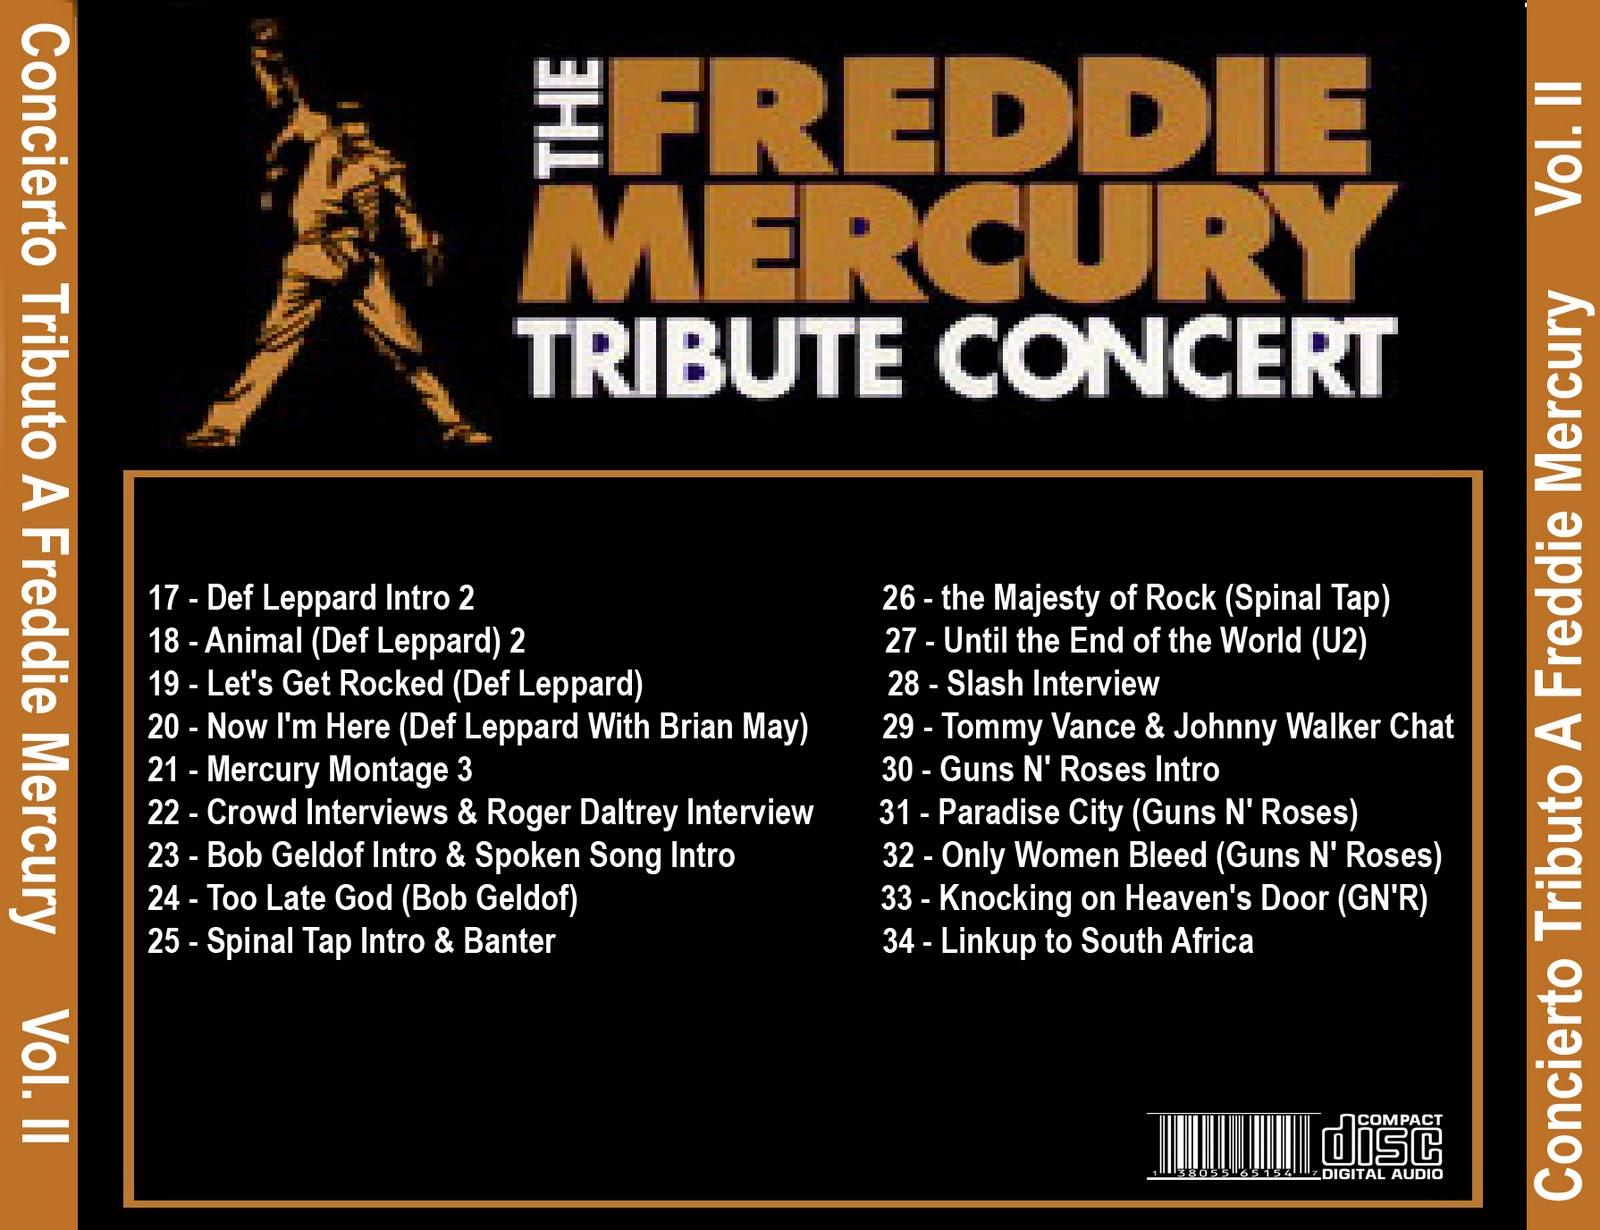 Concierto+Tributo+A+Freddie+Mercury+Vol.+II+Frontal+Trasera.jpg